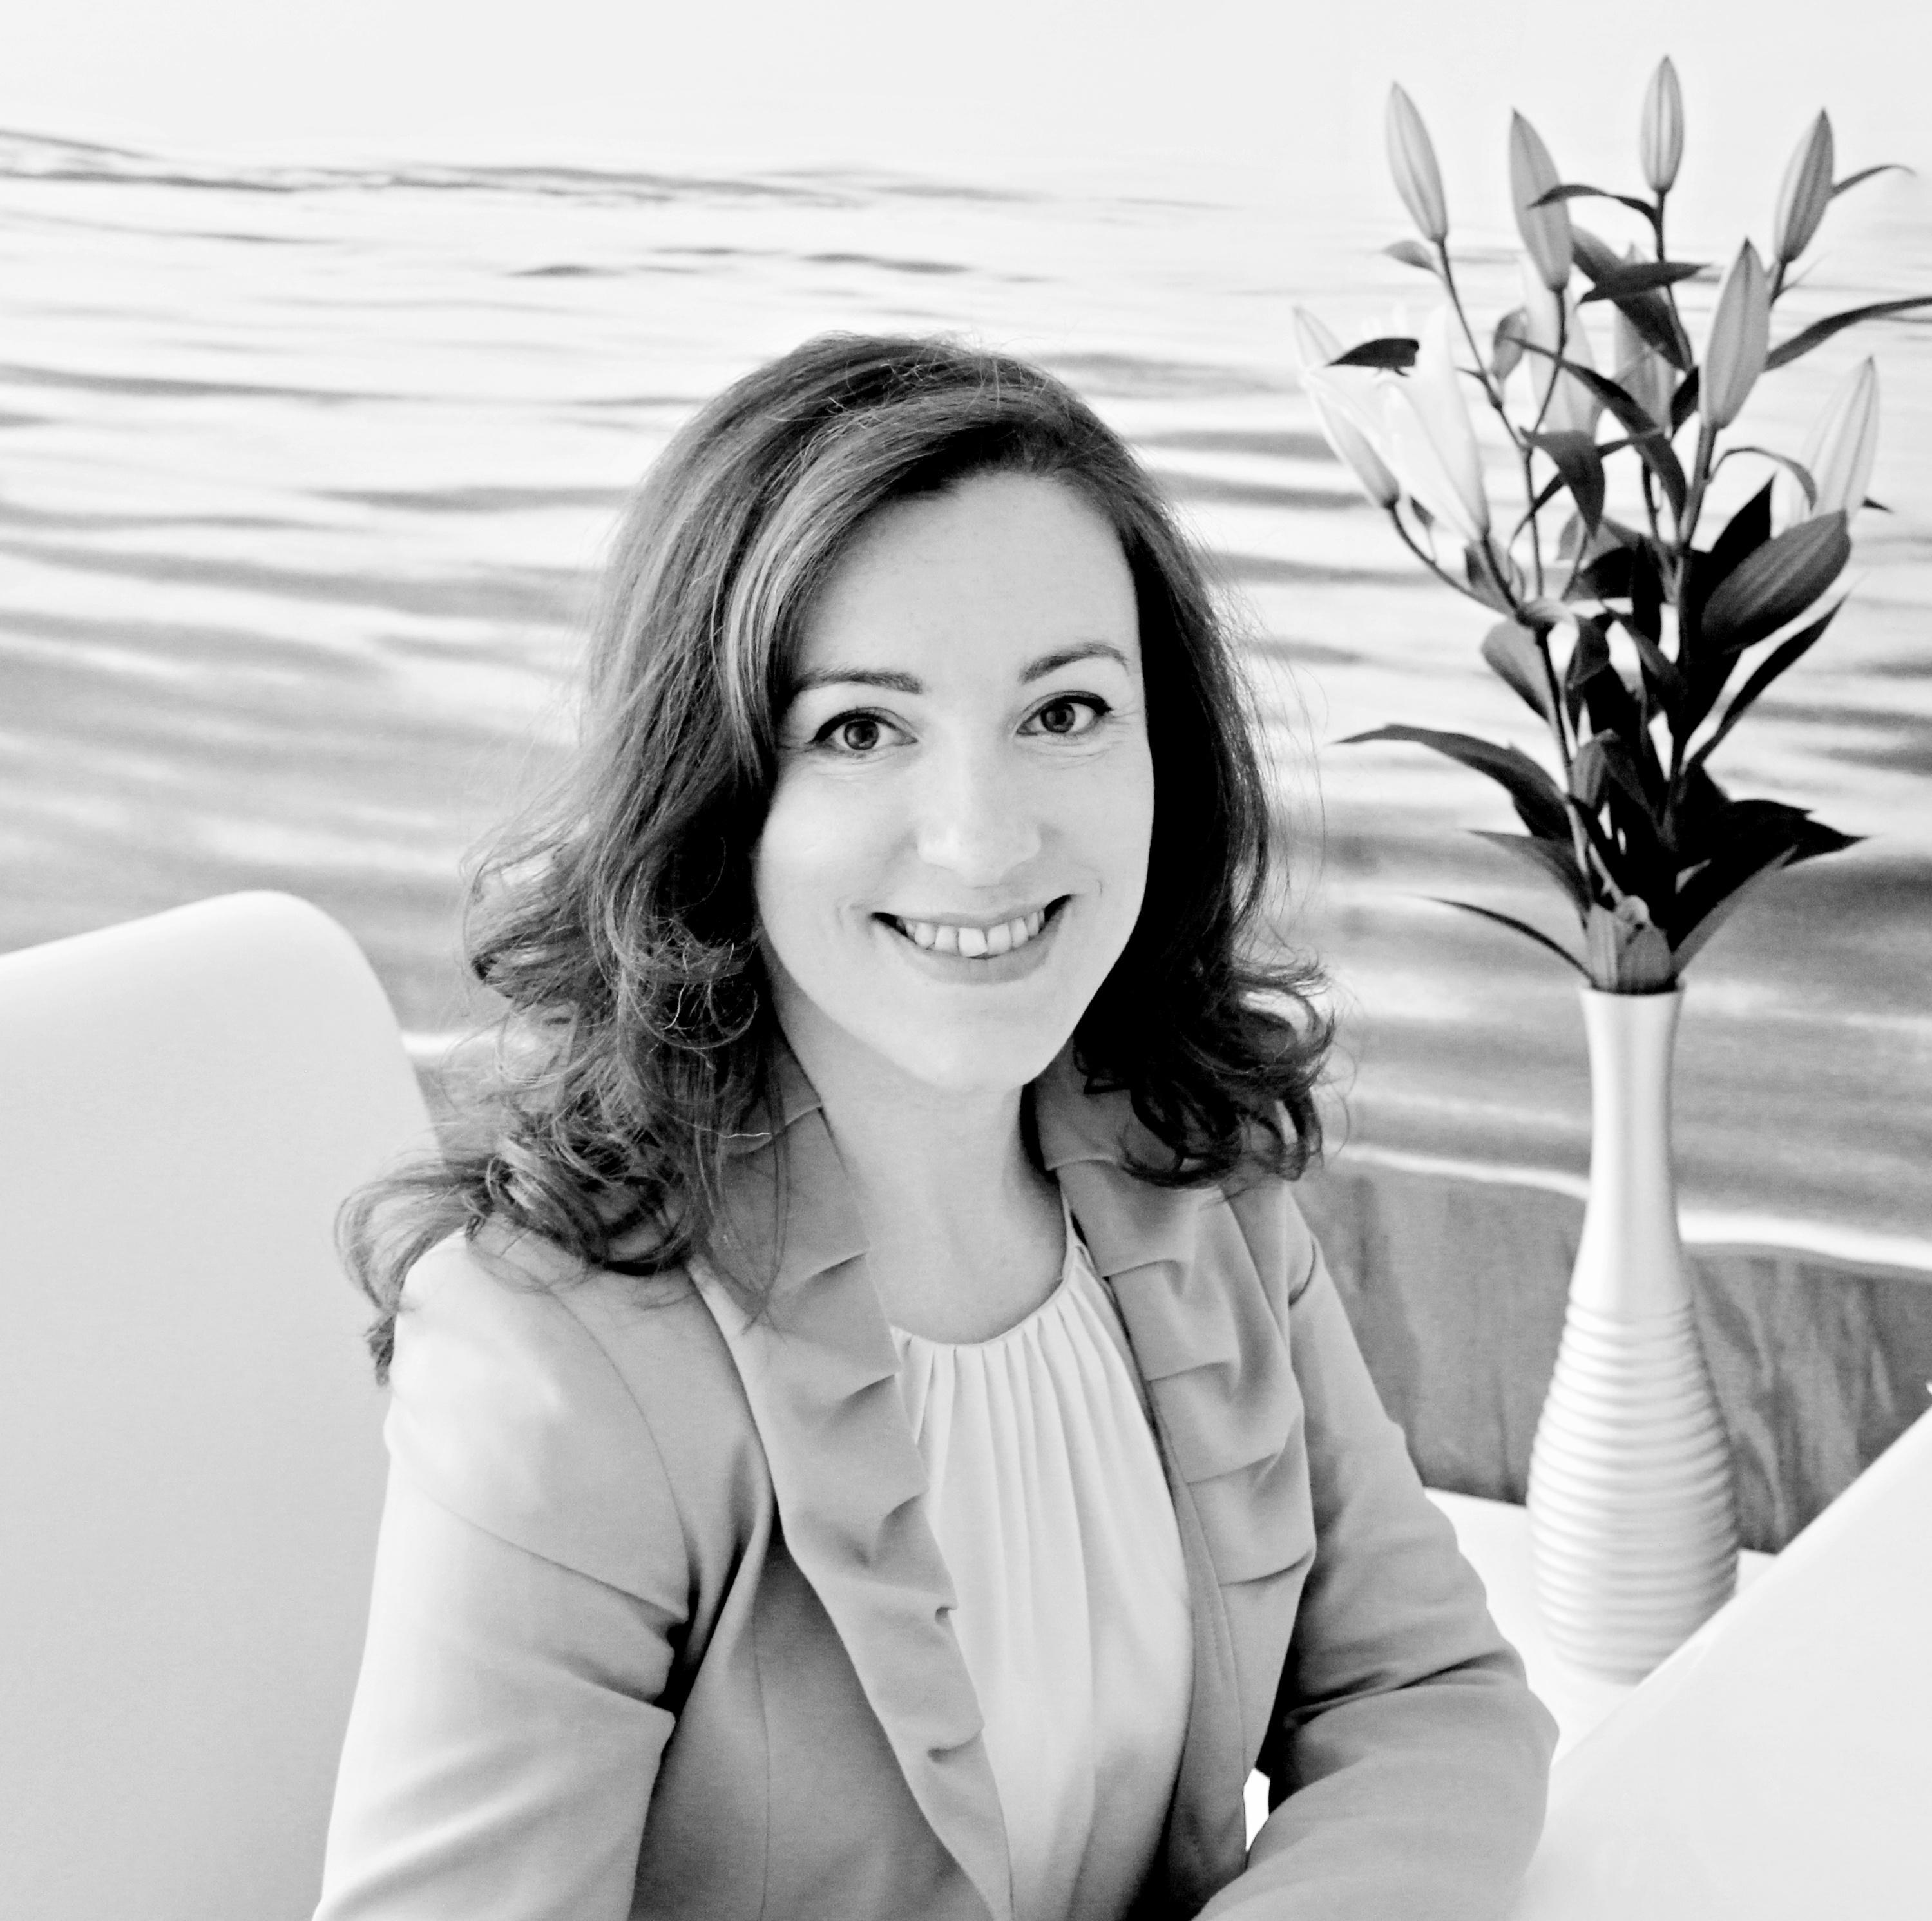 Adriana Kosovska